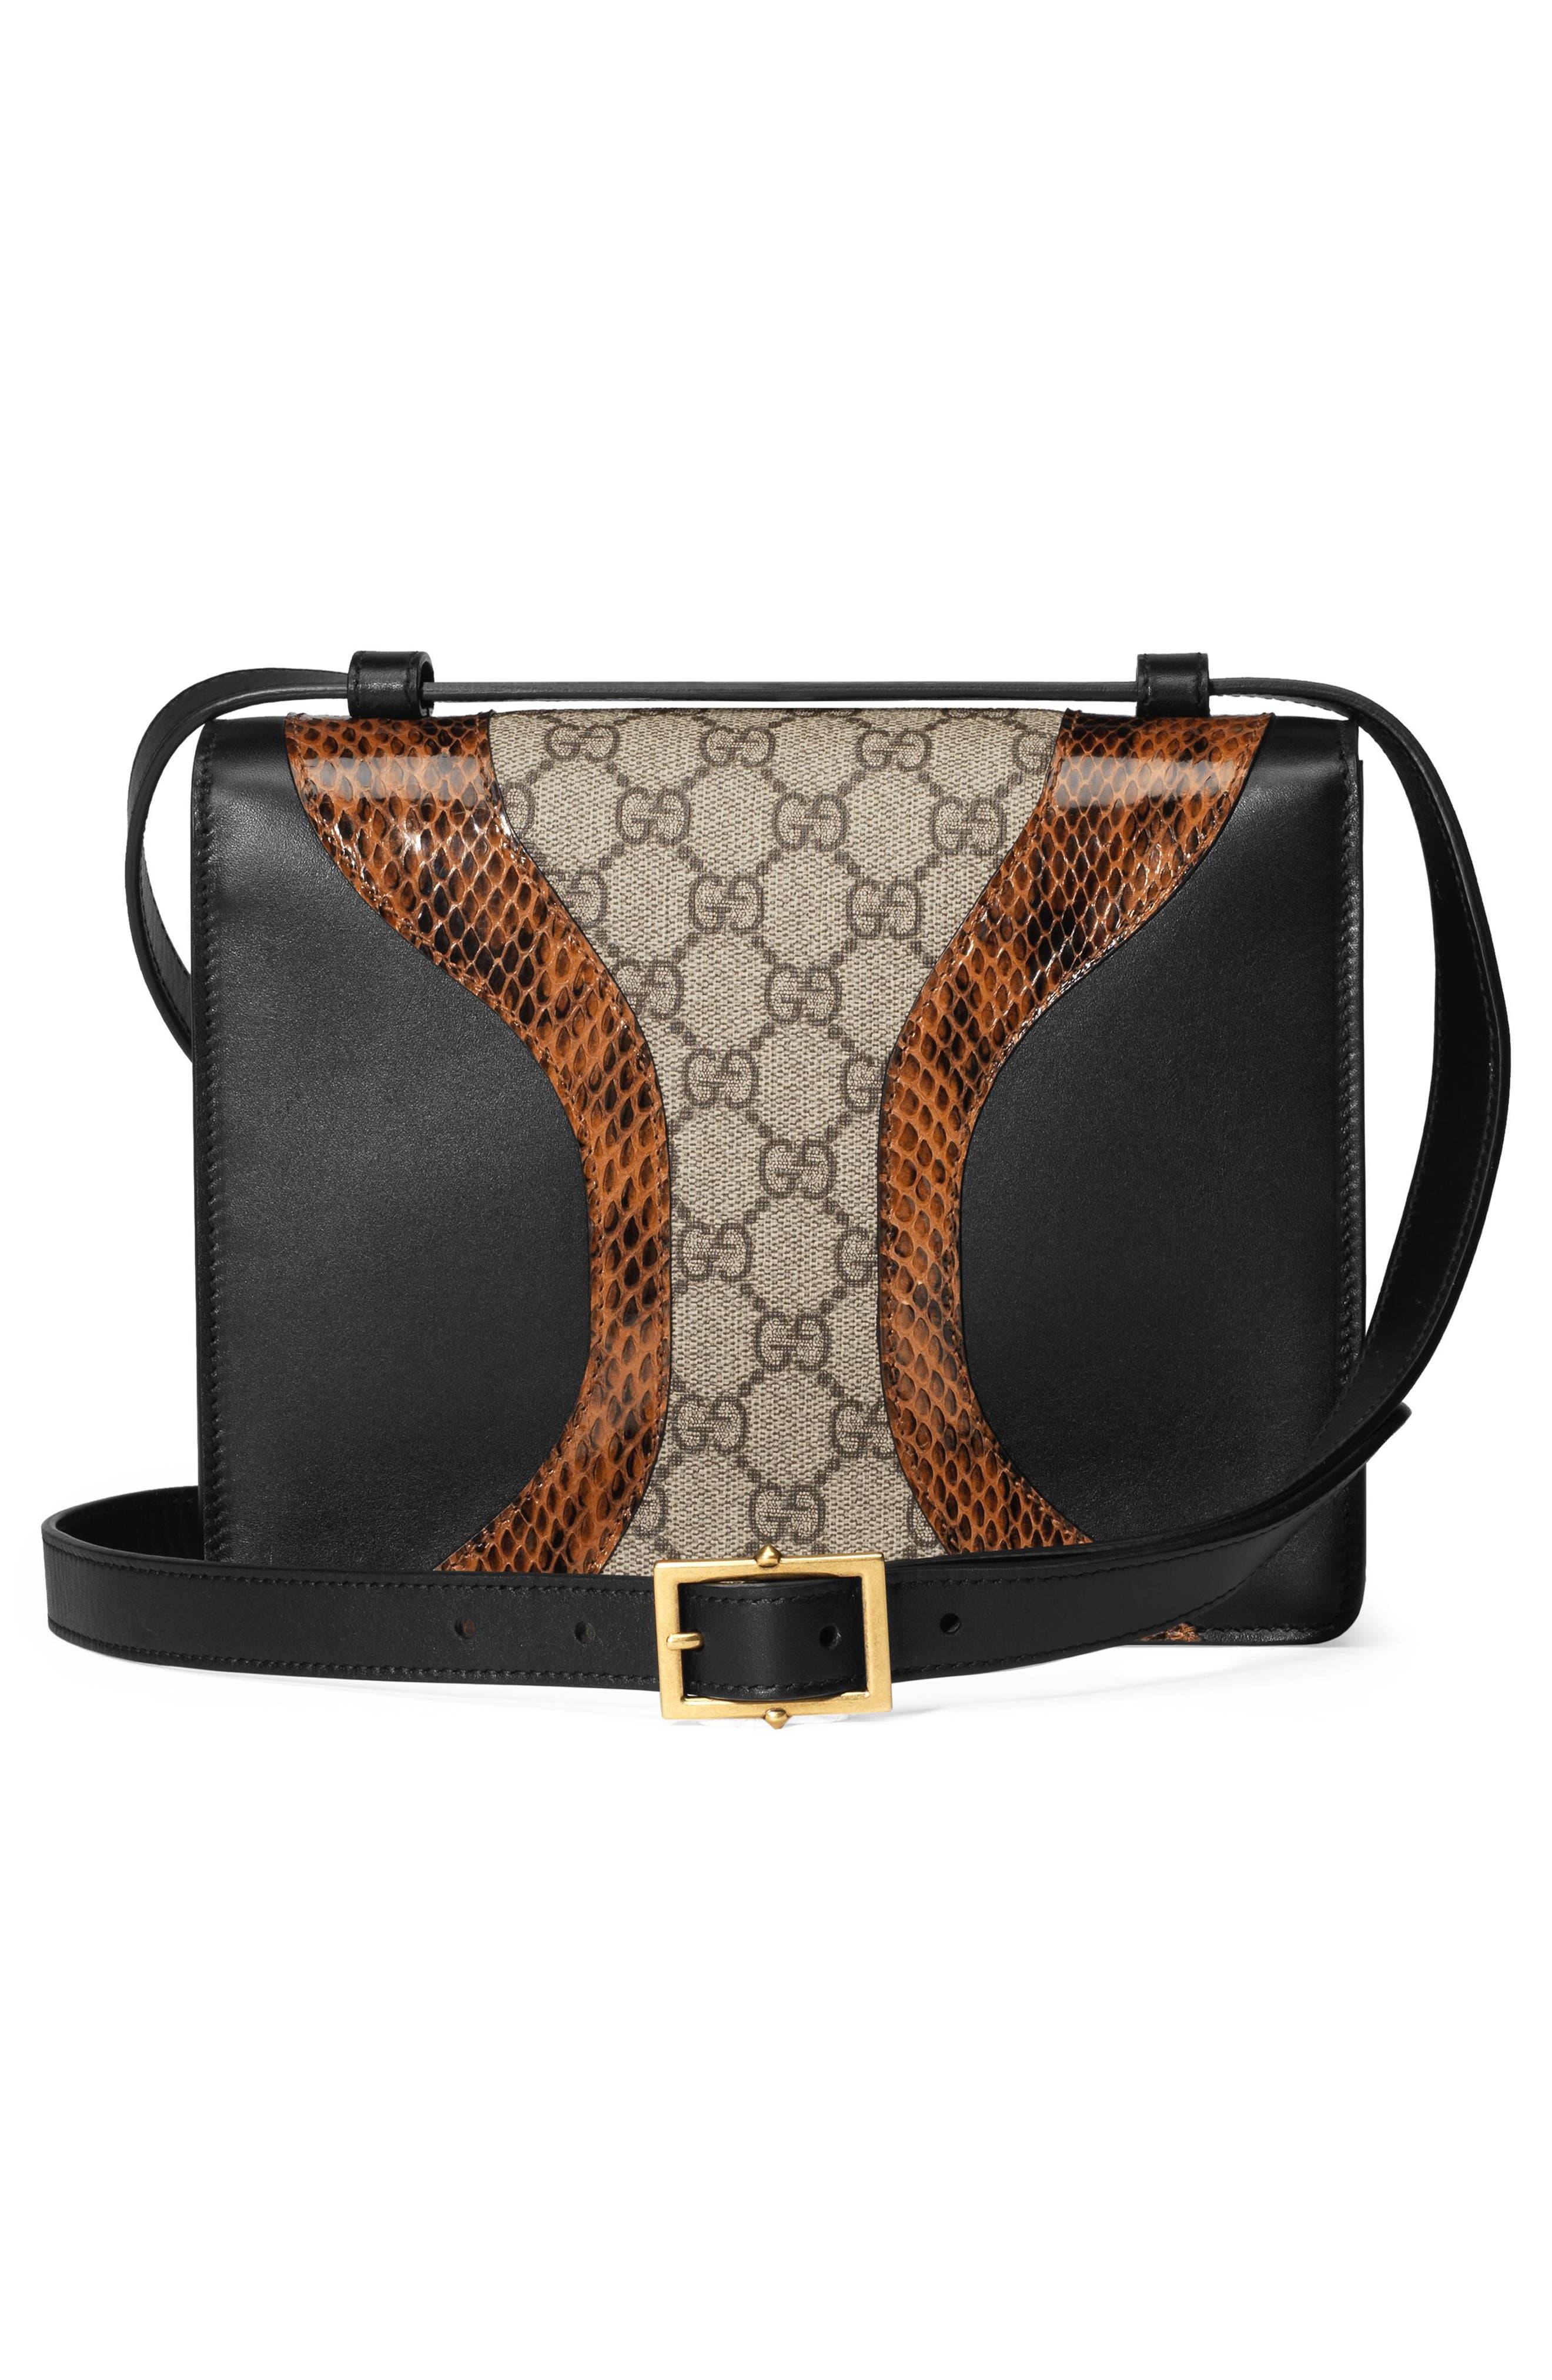 Osiride Genuine Snakeskin & GG Supreme Shoulder Bag,                             Alternate thumbnail 2, color,                             Nero/ Cuir/ Beige Ebony/ Ruby